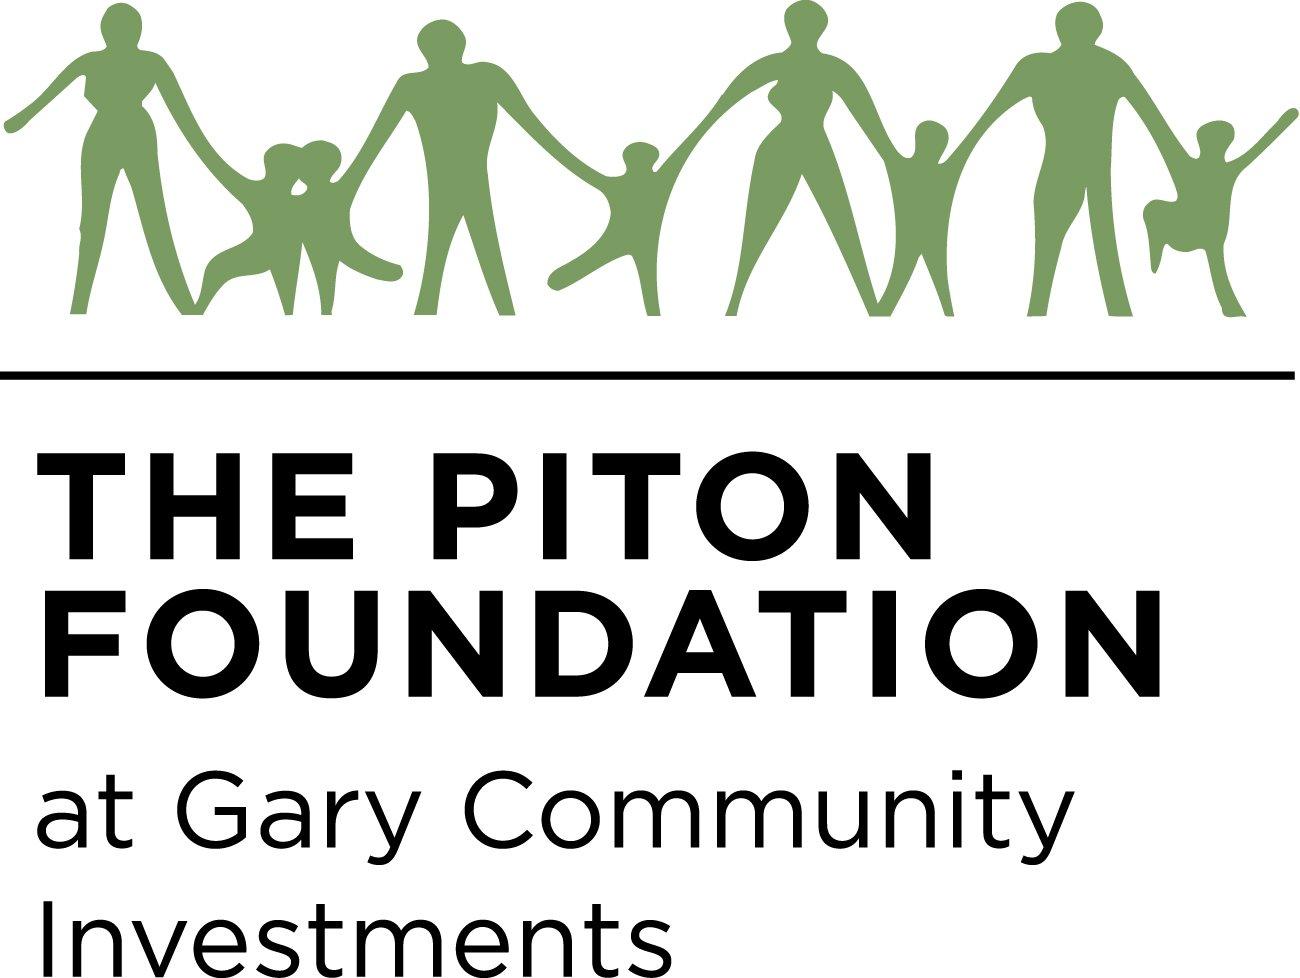 Piton Foundation